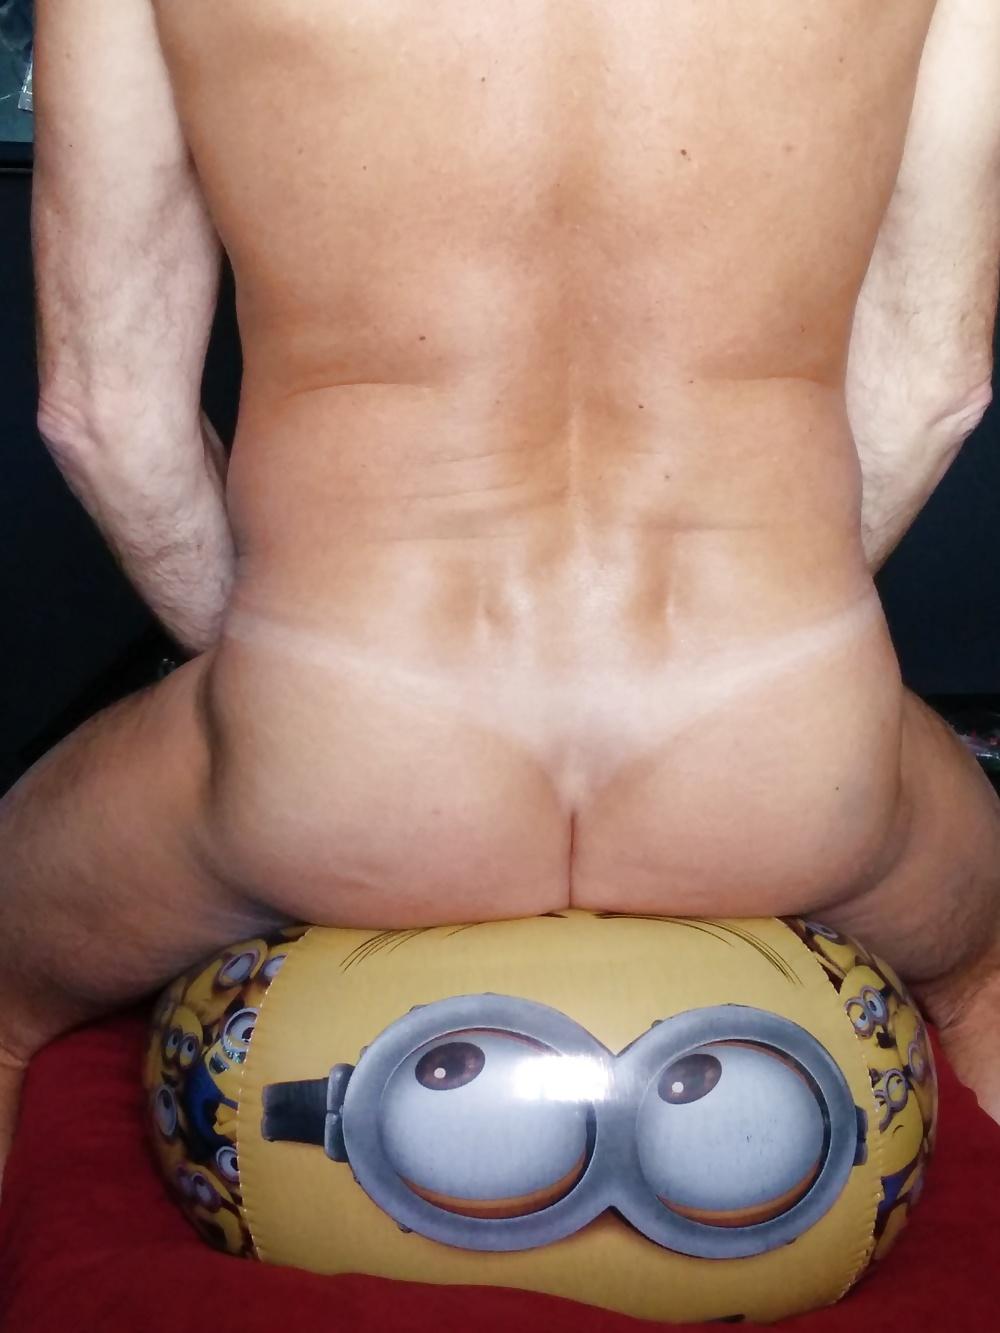 Minion sex by boof brothaz